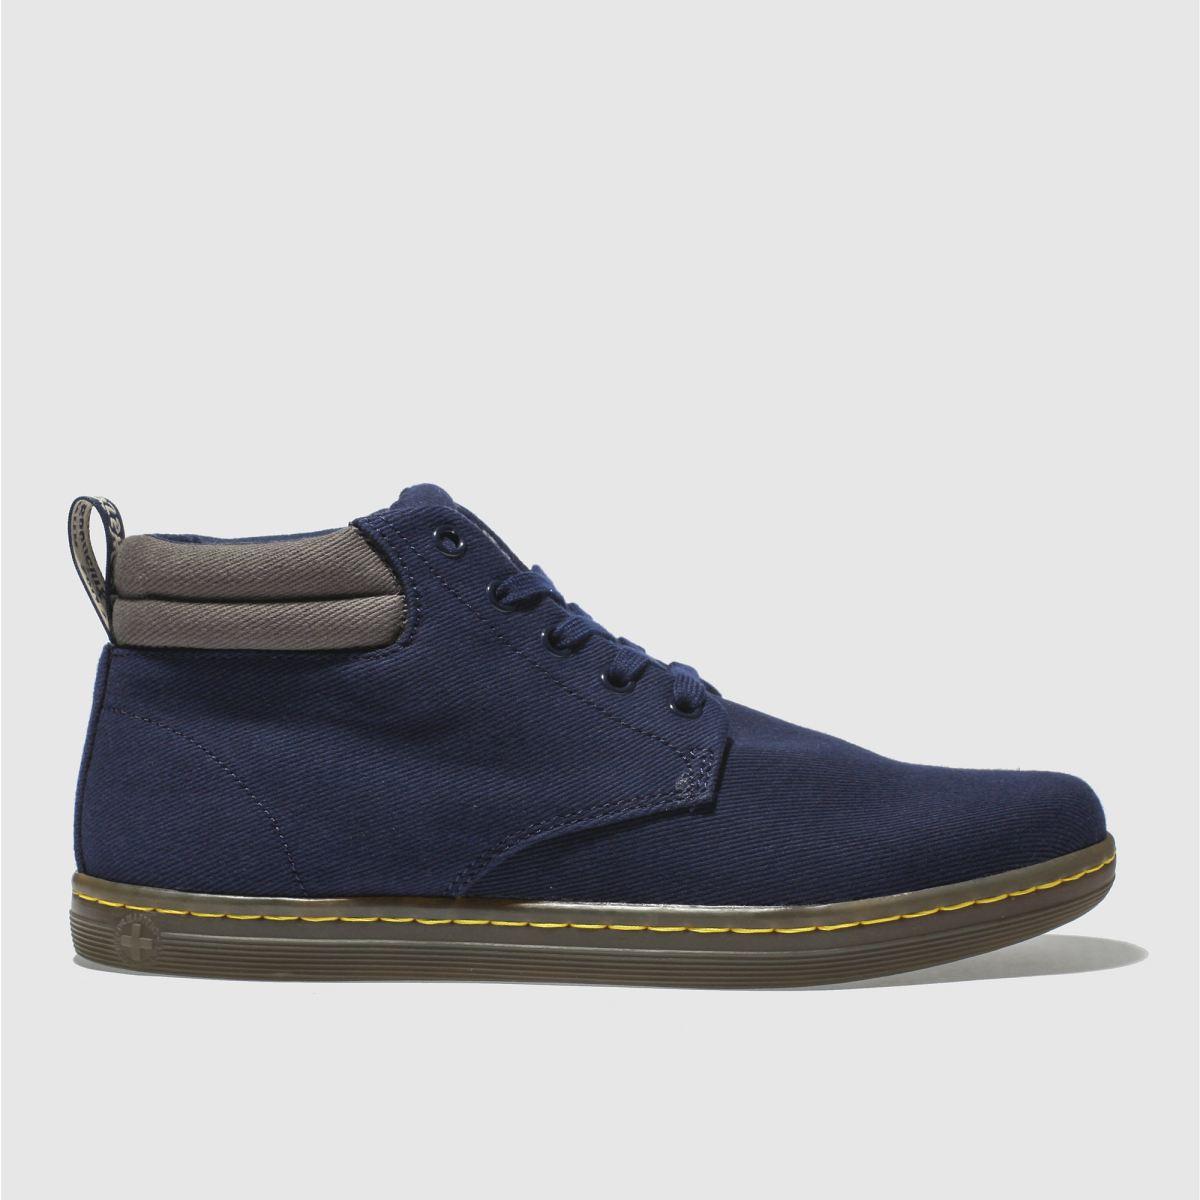 Dr Martens Navy Maleke Boots